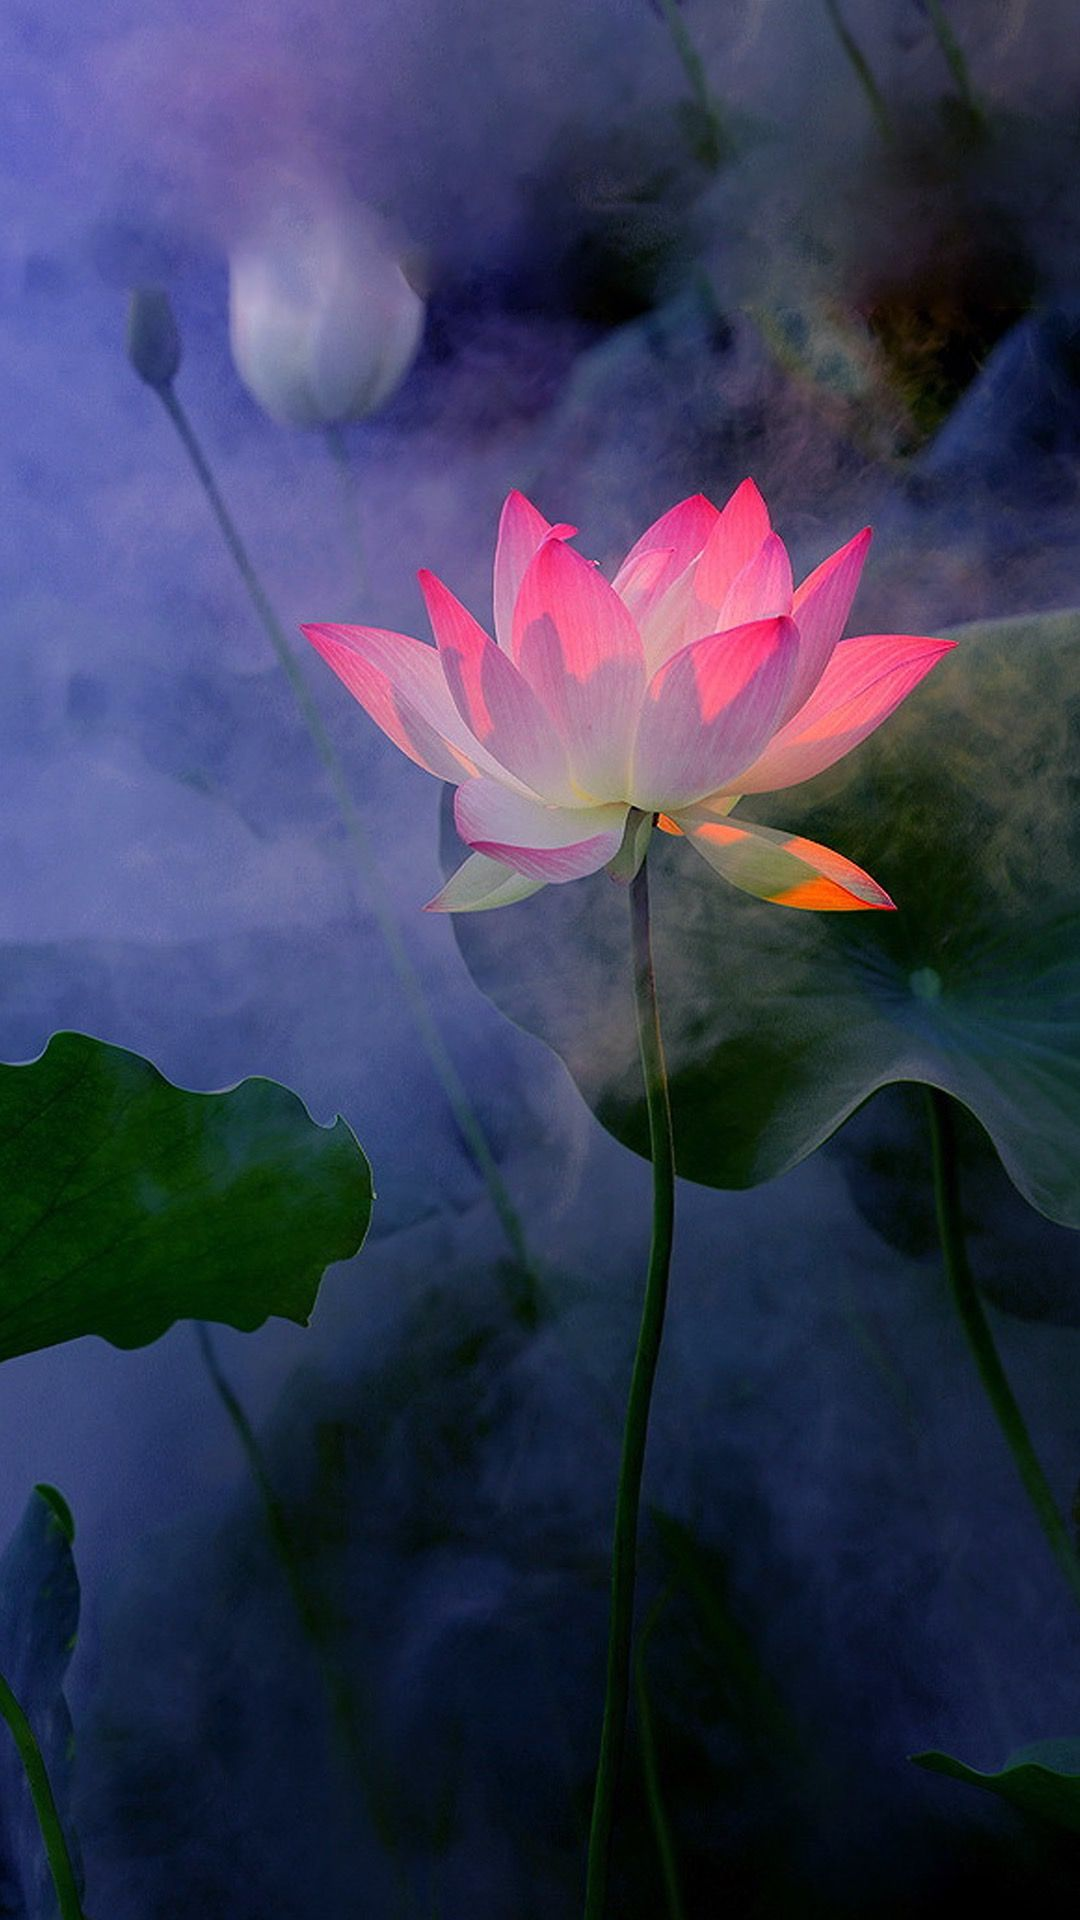 Pin by DrUmesh Pandey on iPhone wallpaper Flowers, Lotus